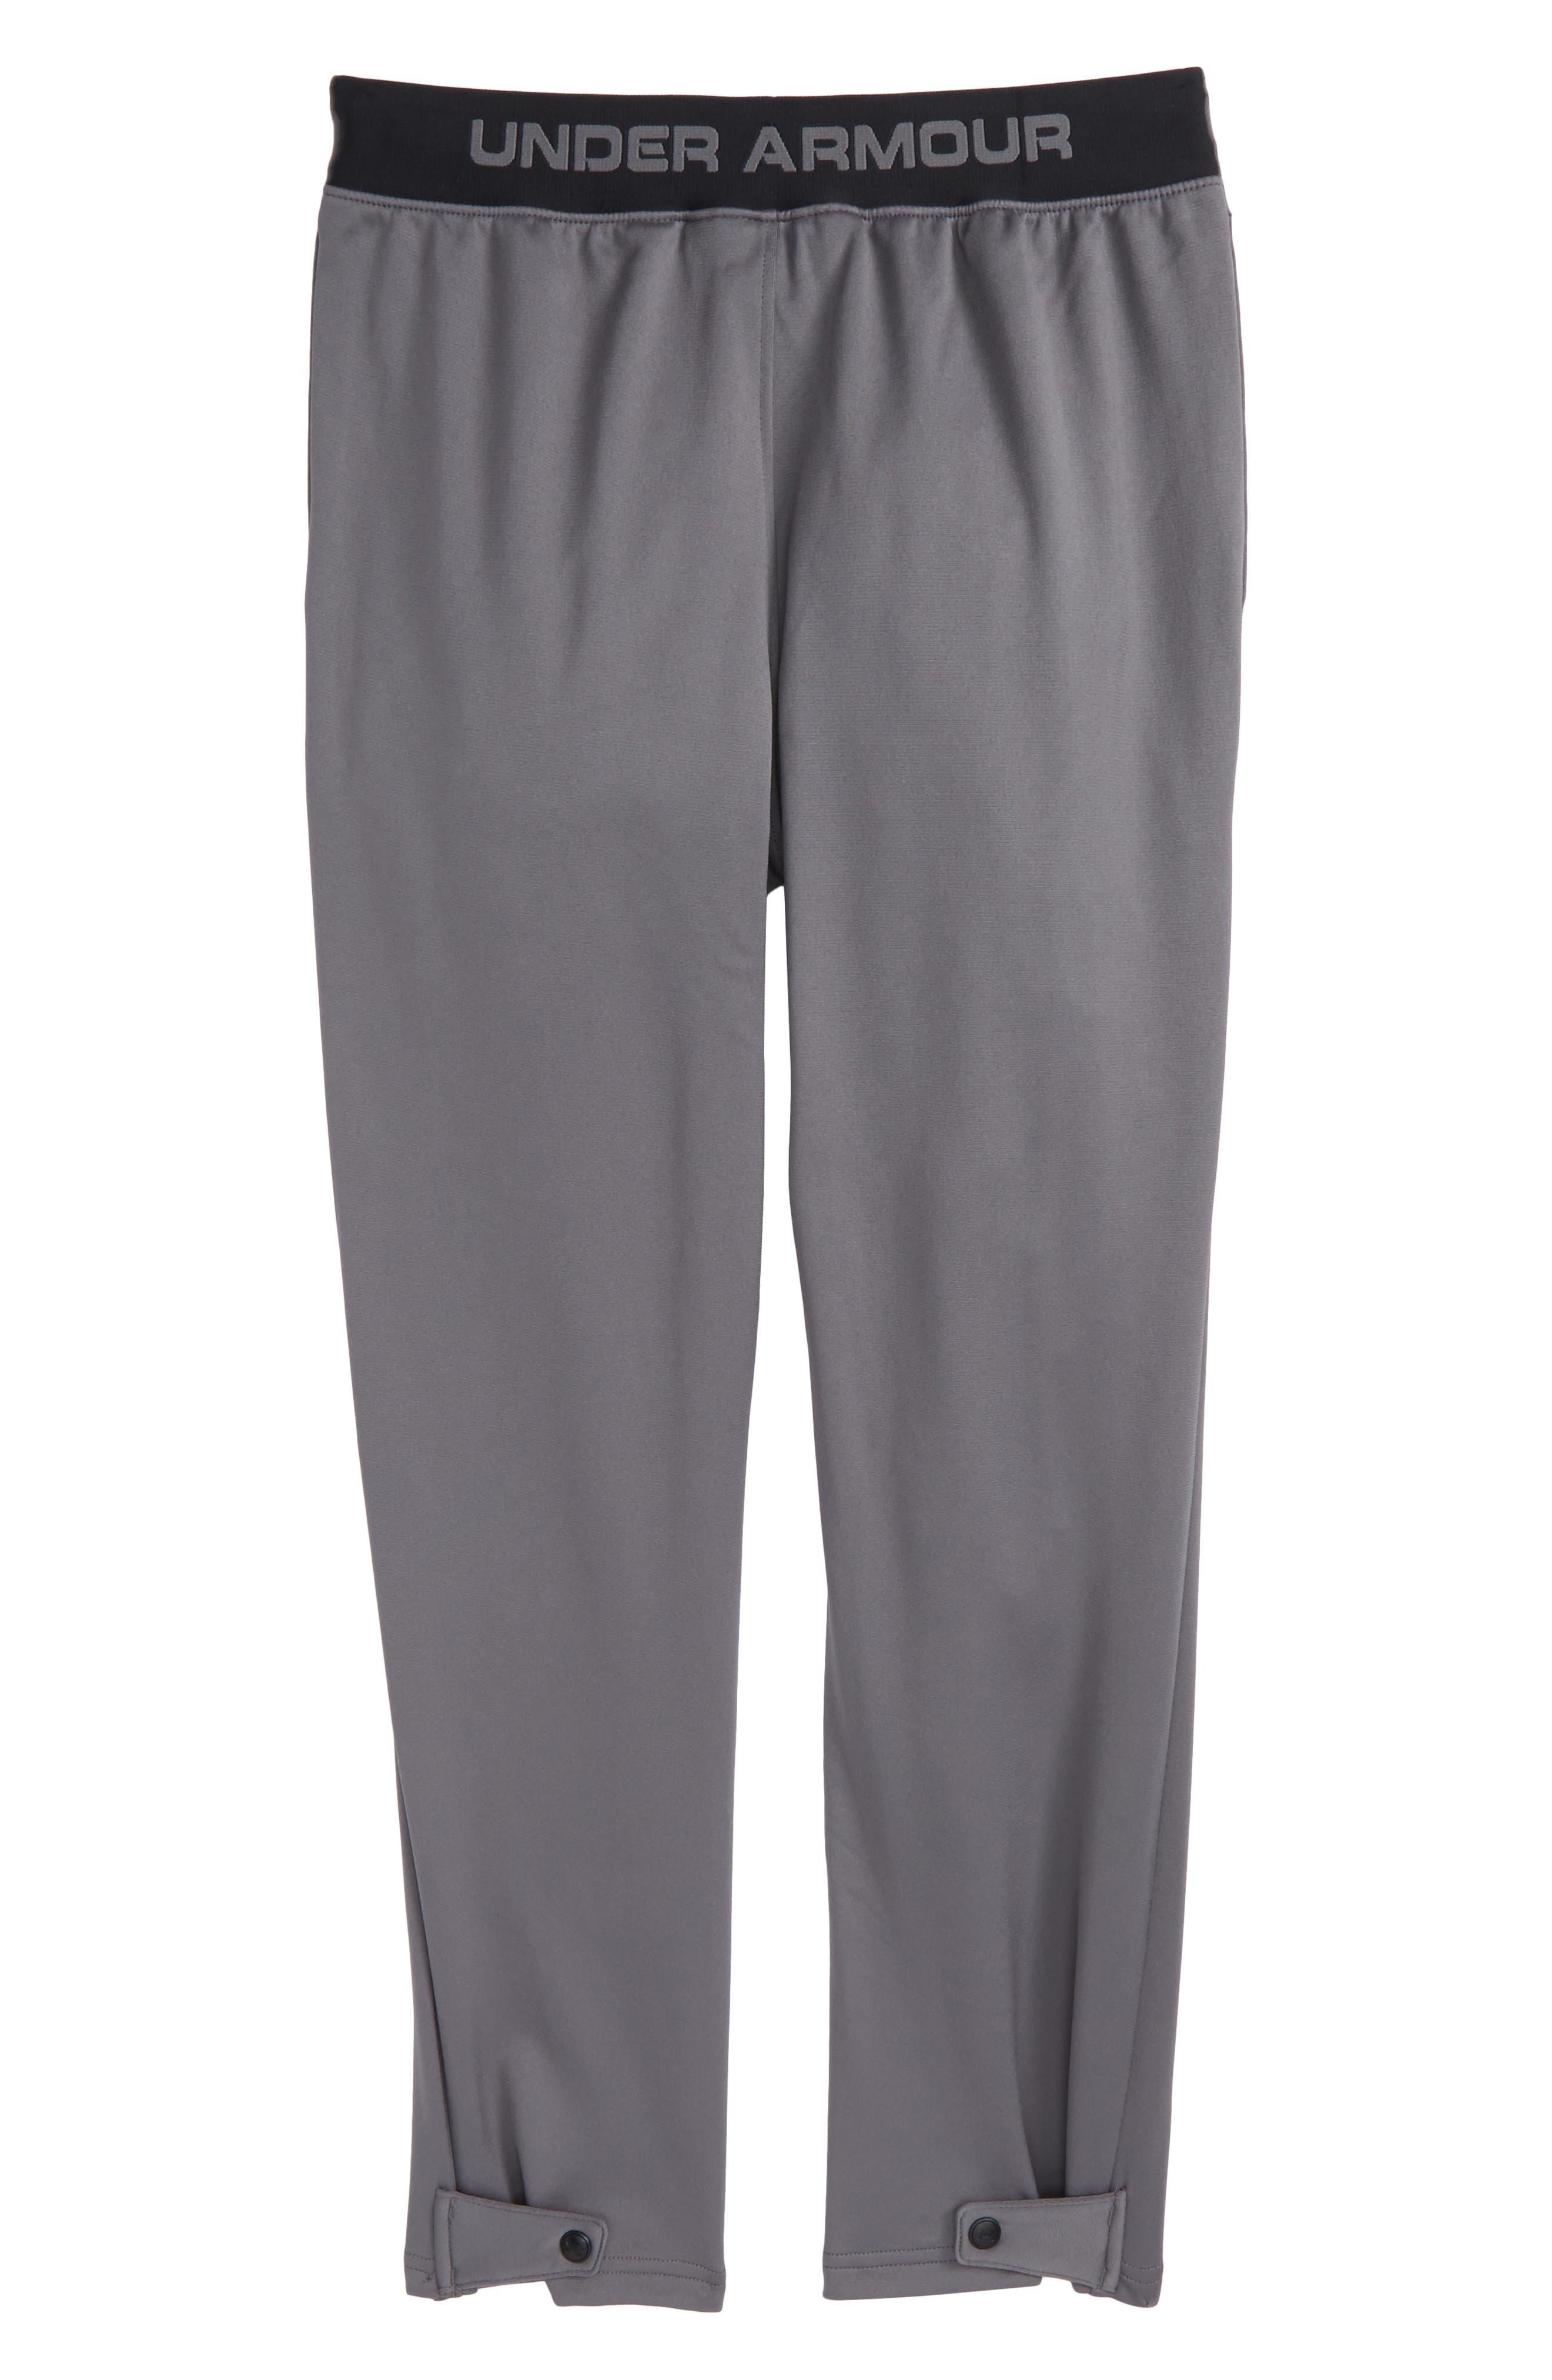 Brawler Slim Sweatpants,                             Alternate thumbnail 2, color,                             Graphite/ Black